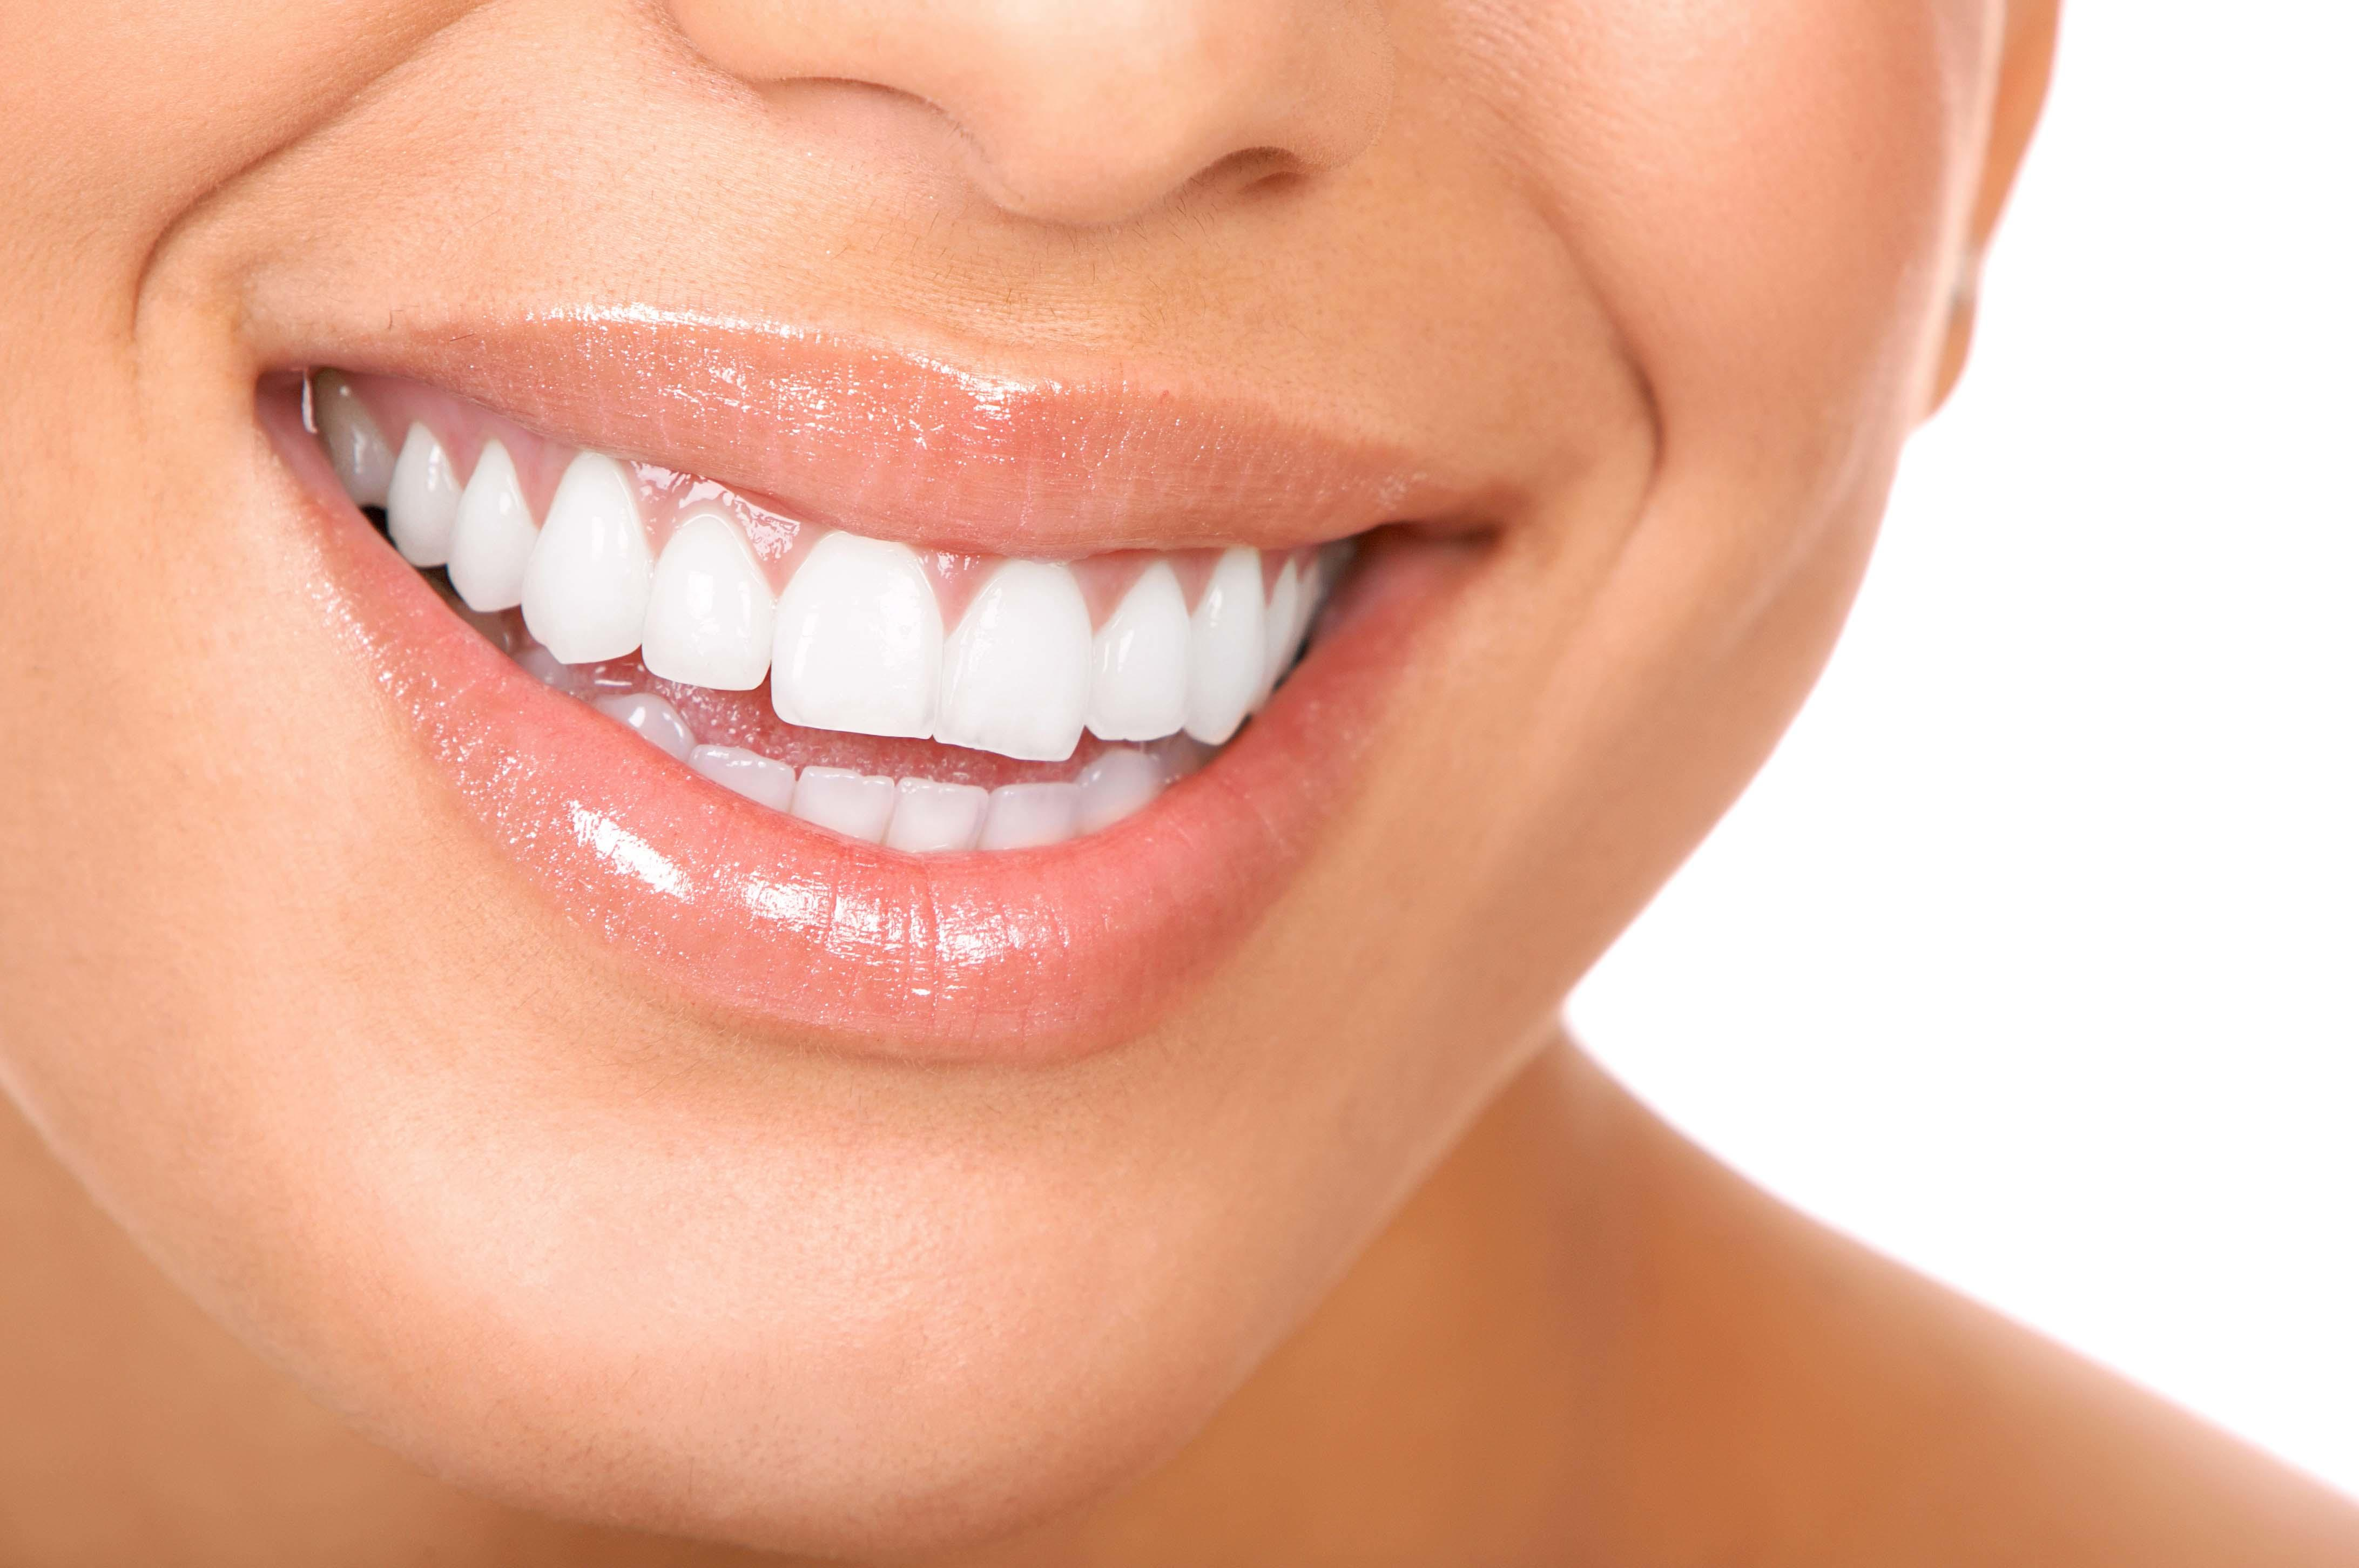 sleepright mouth reviews dp com comfort to ultra amazon dental comforter dura grinding guard